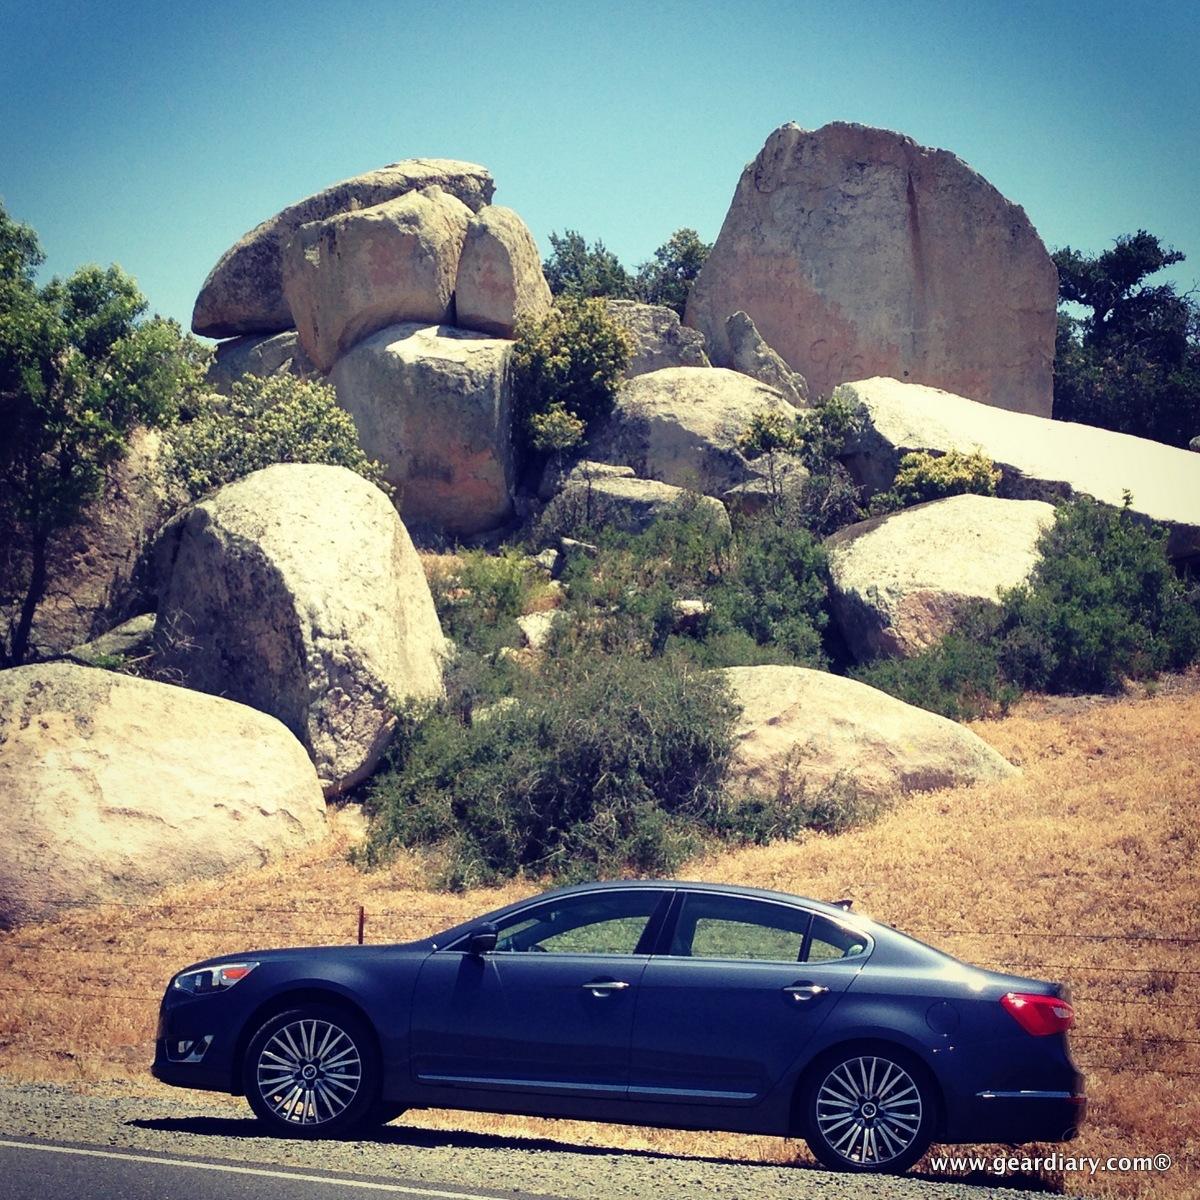 2014 Kia Cadenza Interior: 2014 Kia Cadenza Stylishly Conquers The Pacific Coast